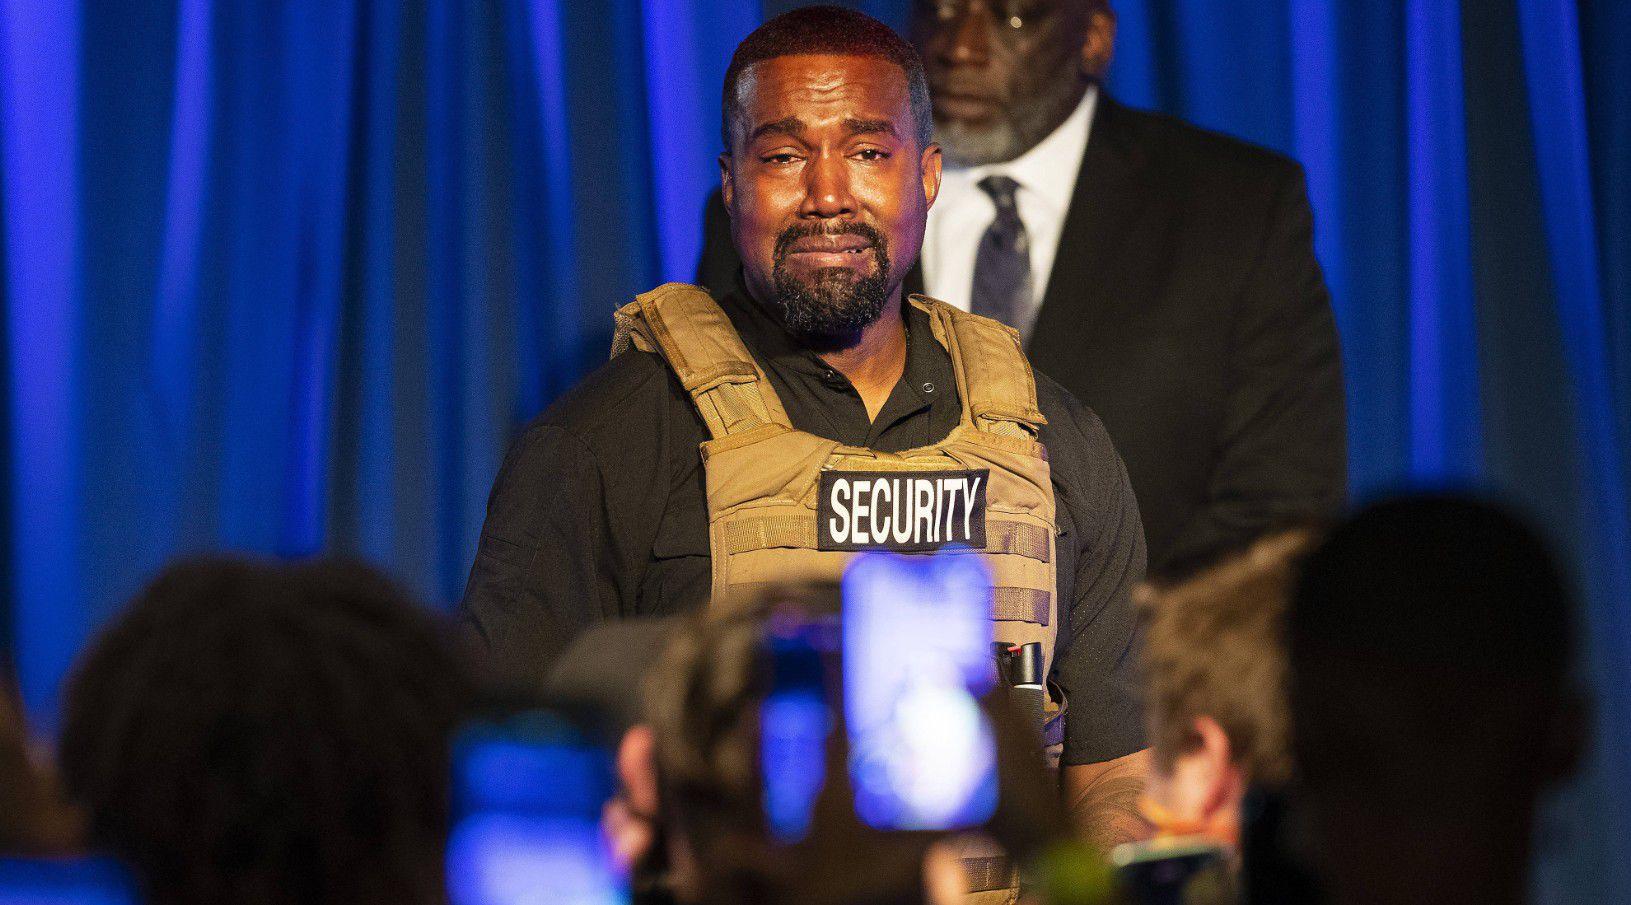 Kanye West fond en larmes à son 1er meeting, sa santé mentale interroge